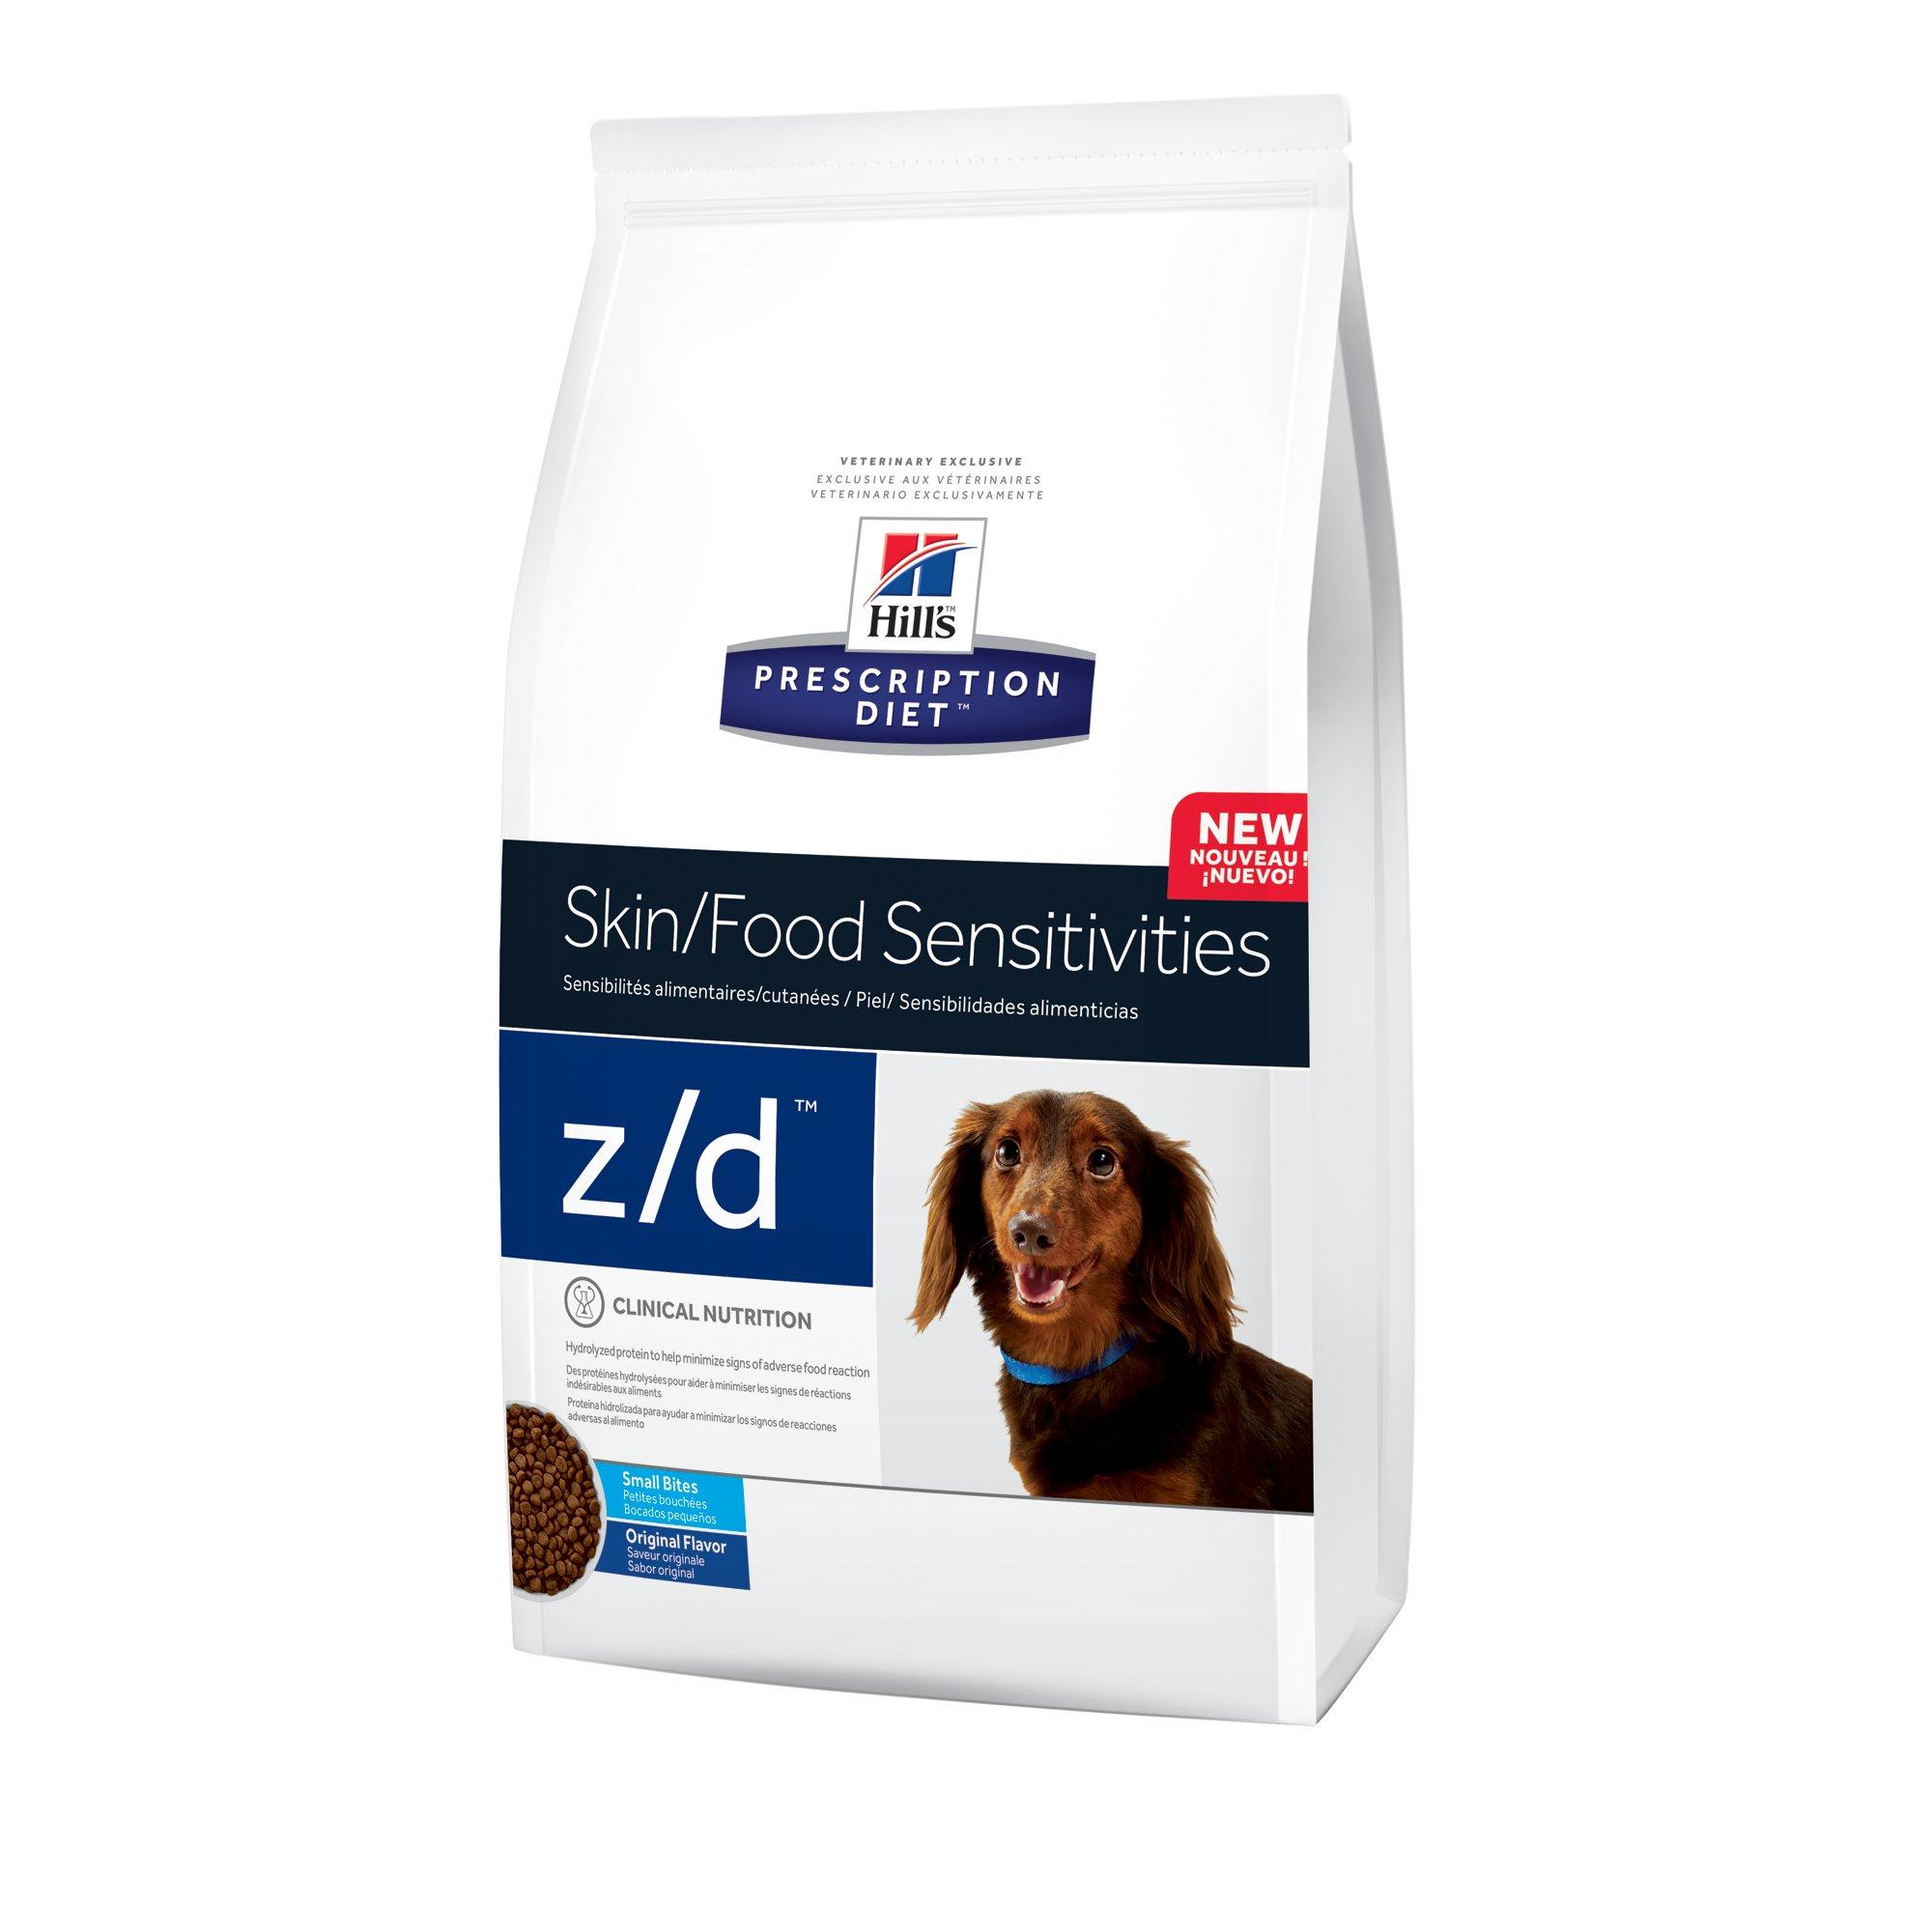 Hill S Prescription Diet Z D Skin Food Sensitivities Small Bites